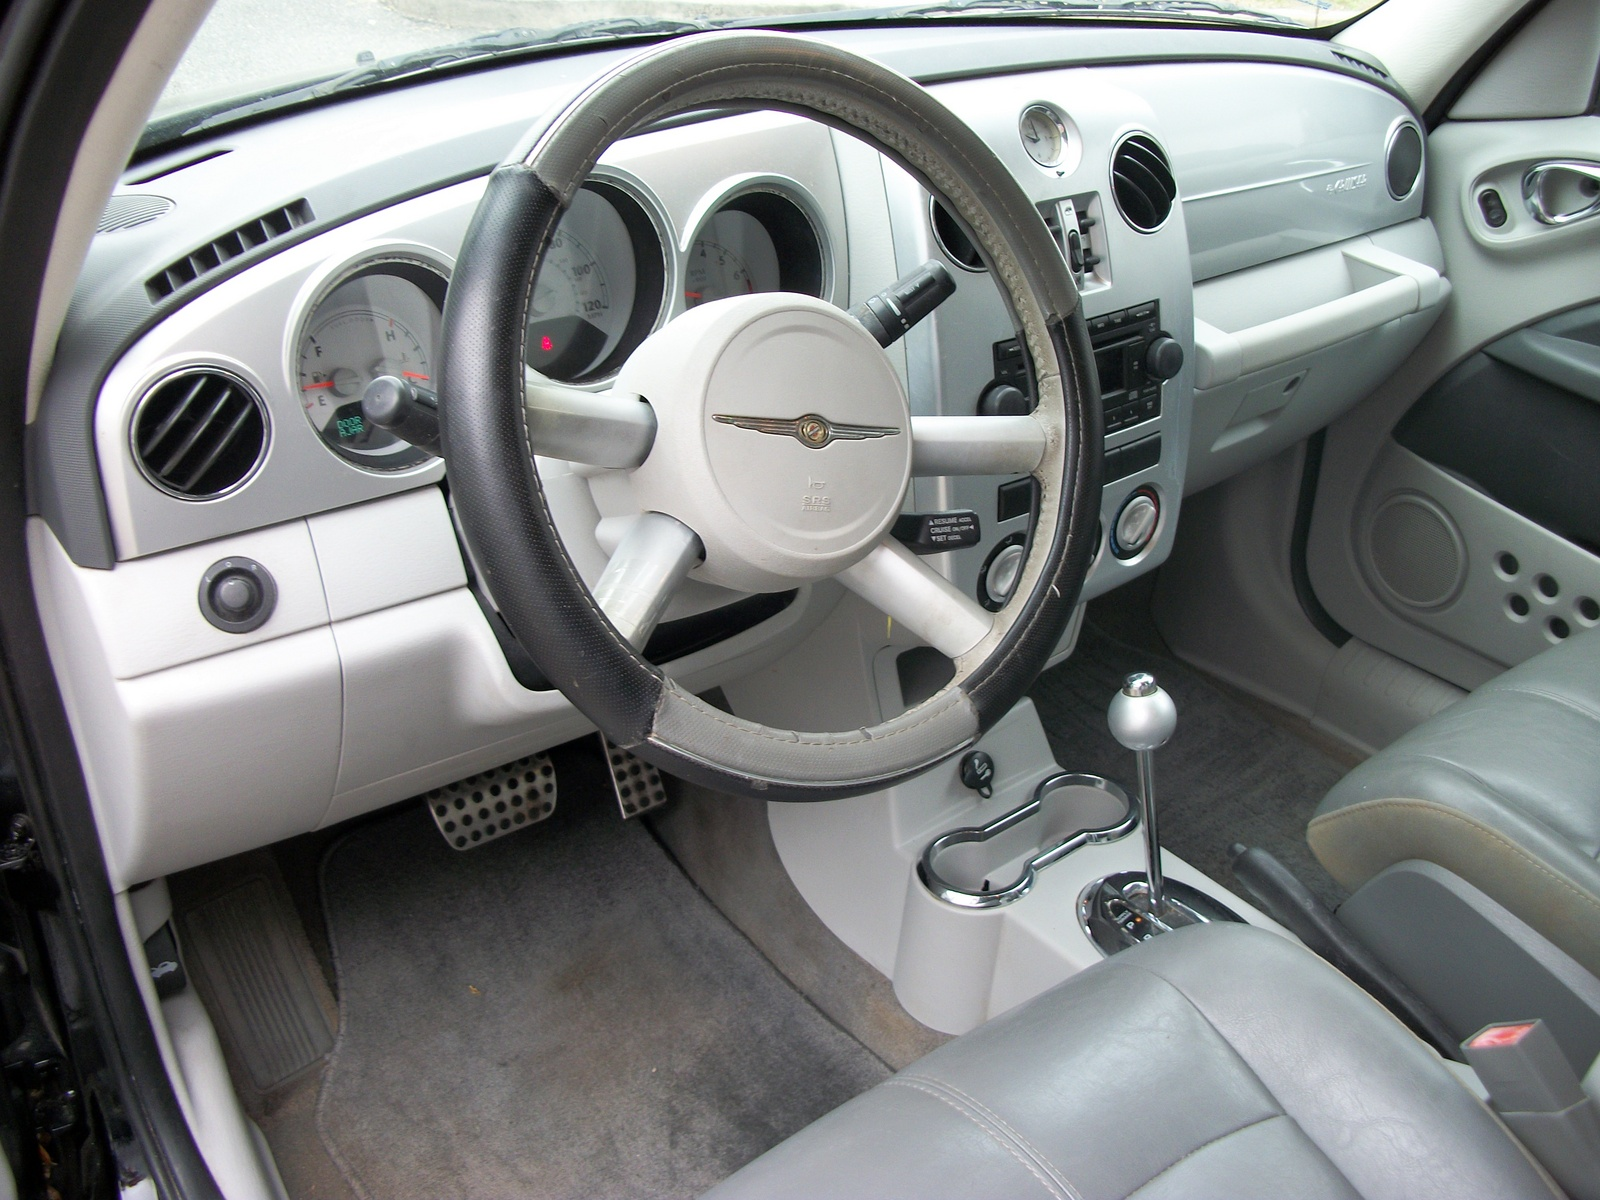 2006 Chrysler Pt Cruiser Pictures Cargurus